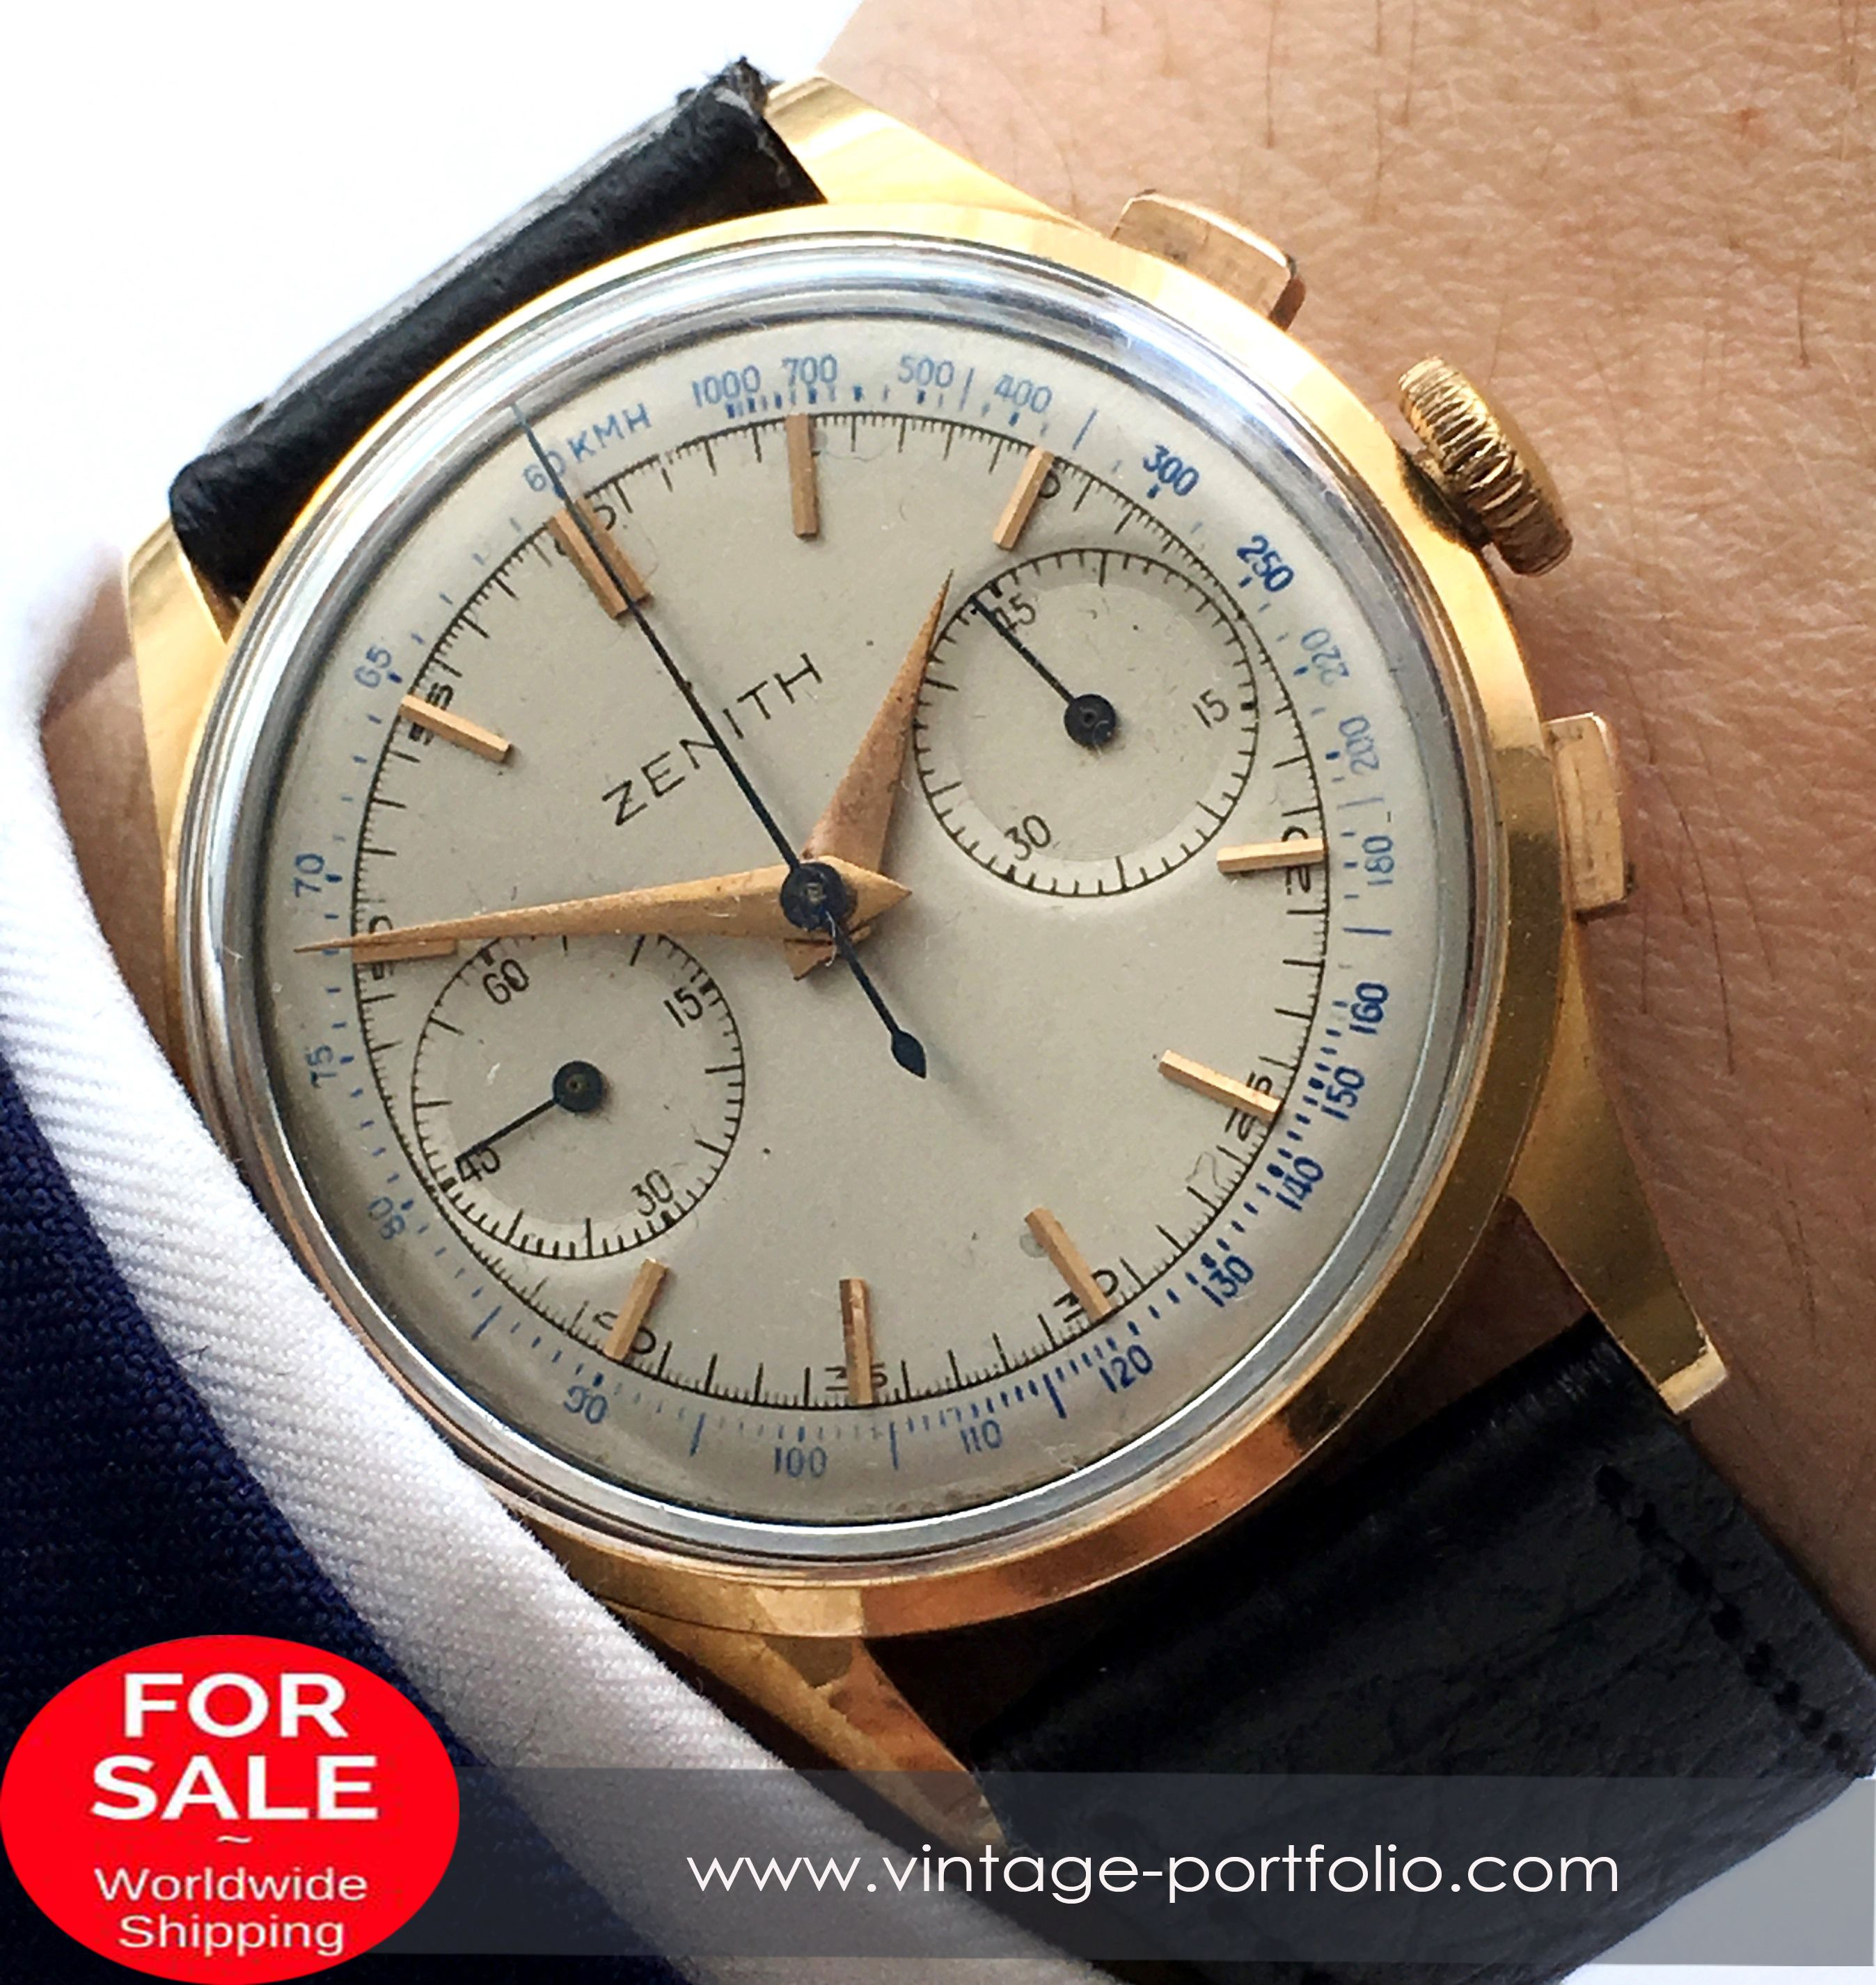 18kt Gold Zenith Vintage Chronograph 37mm Jumbo Luxury Watches